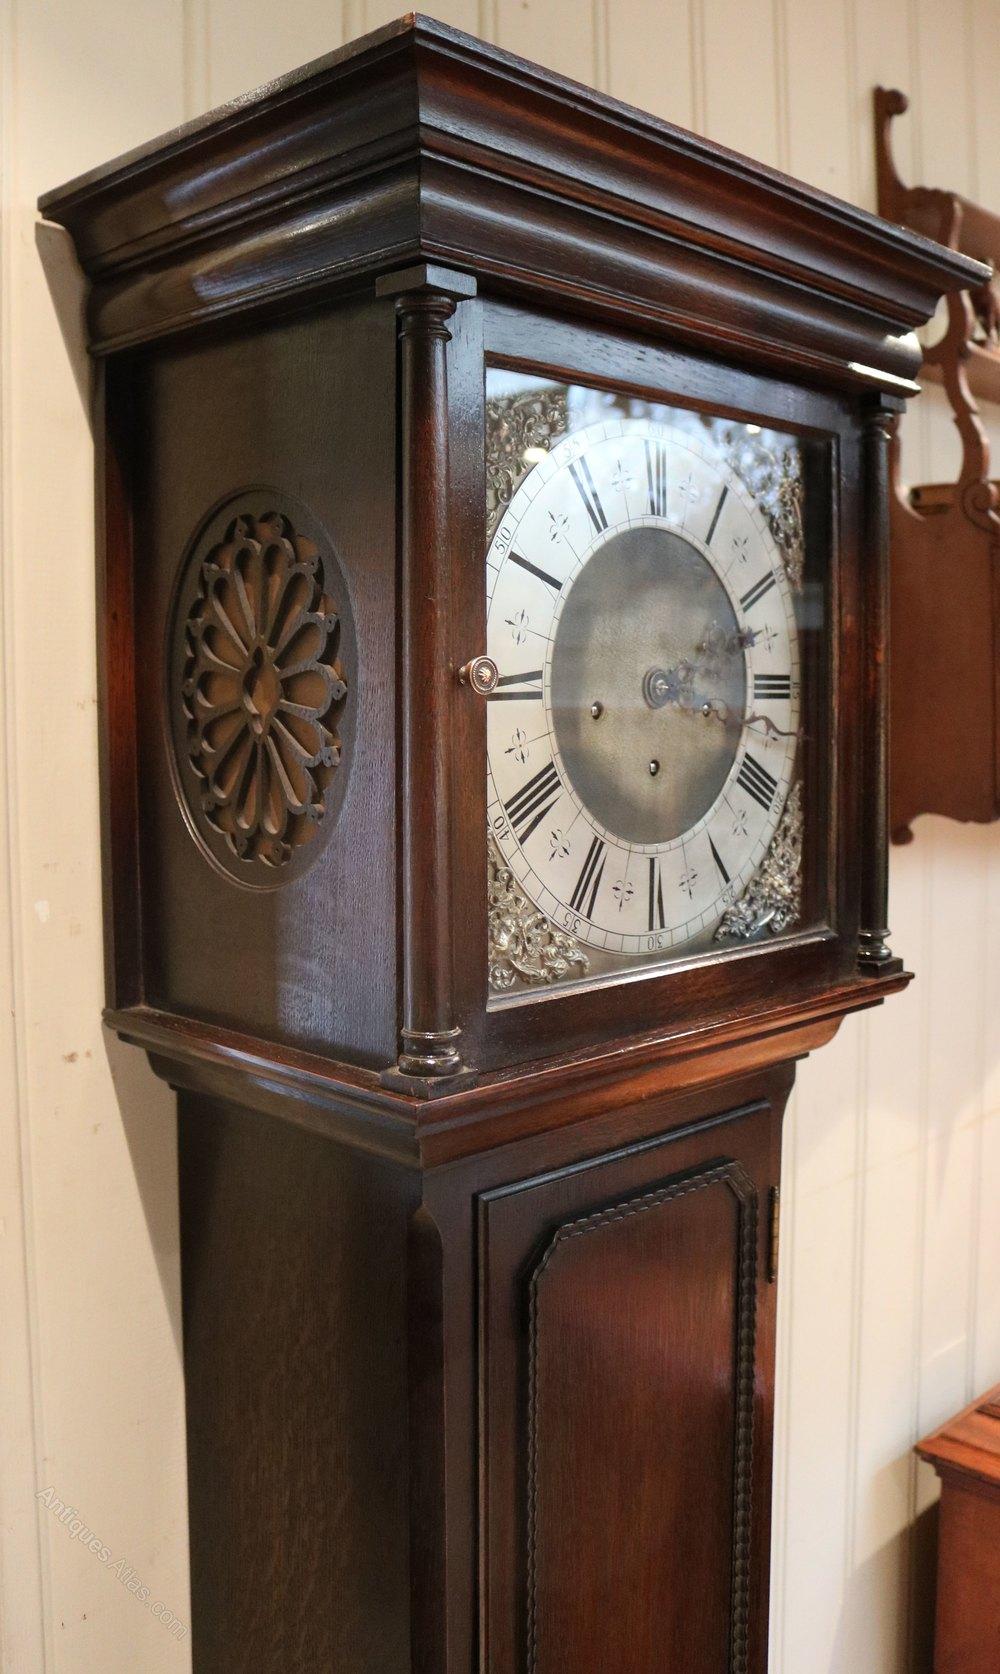 3798842127f Photos. Small Oak Westminster Chime Longcase Clock (England) Antique  Grandfather ...